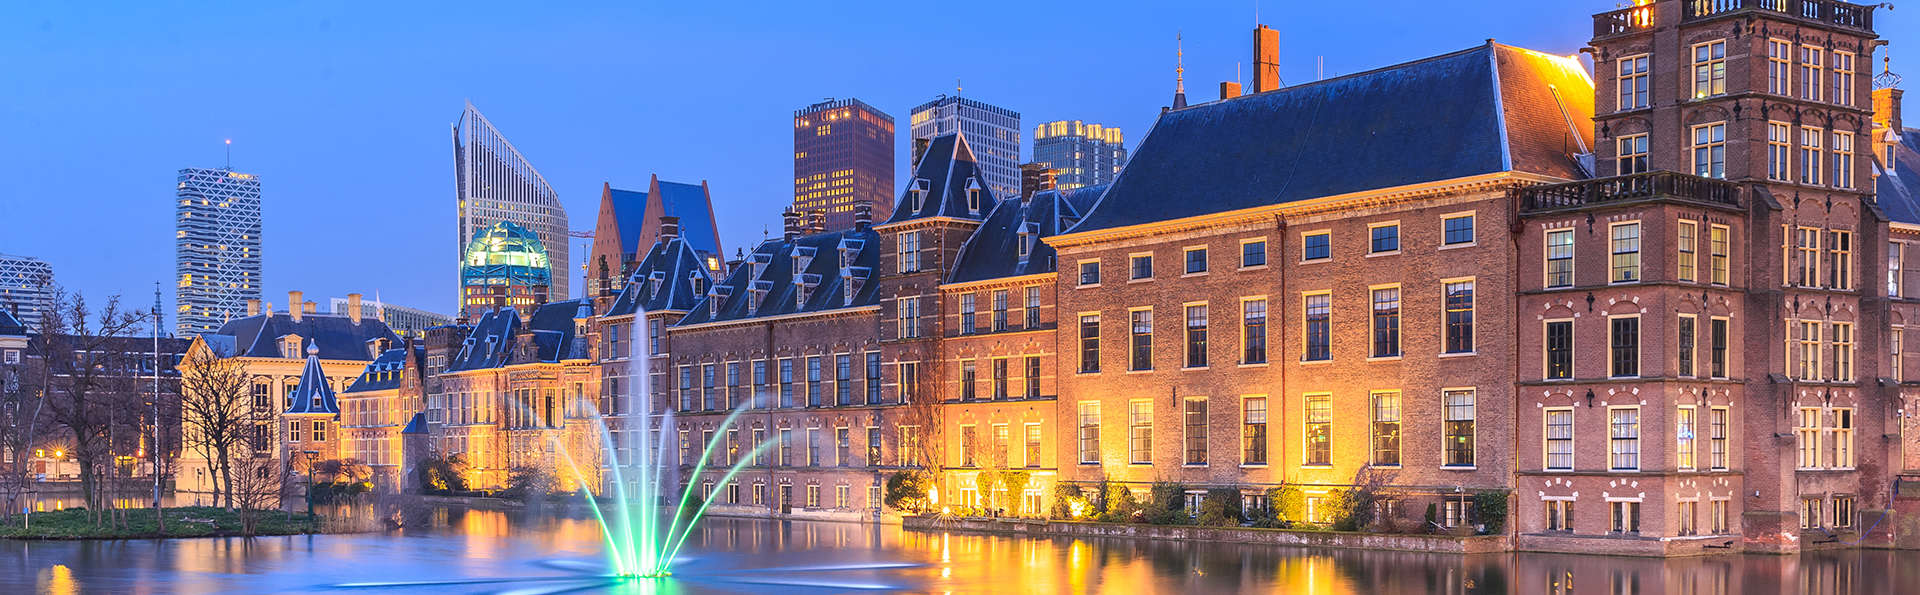 Bastion Hotel Den Haag Rijswijk - Edit_DenHaag.jpg